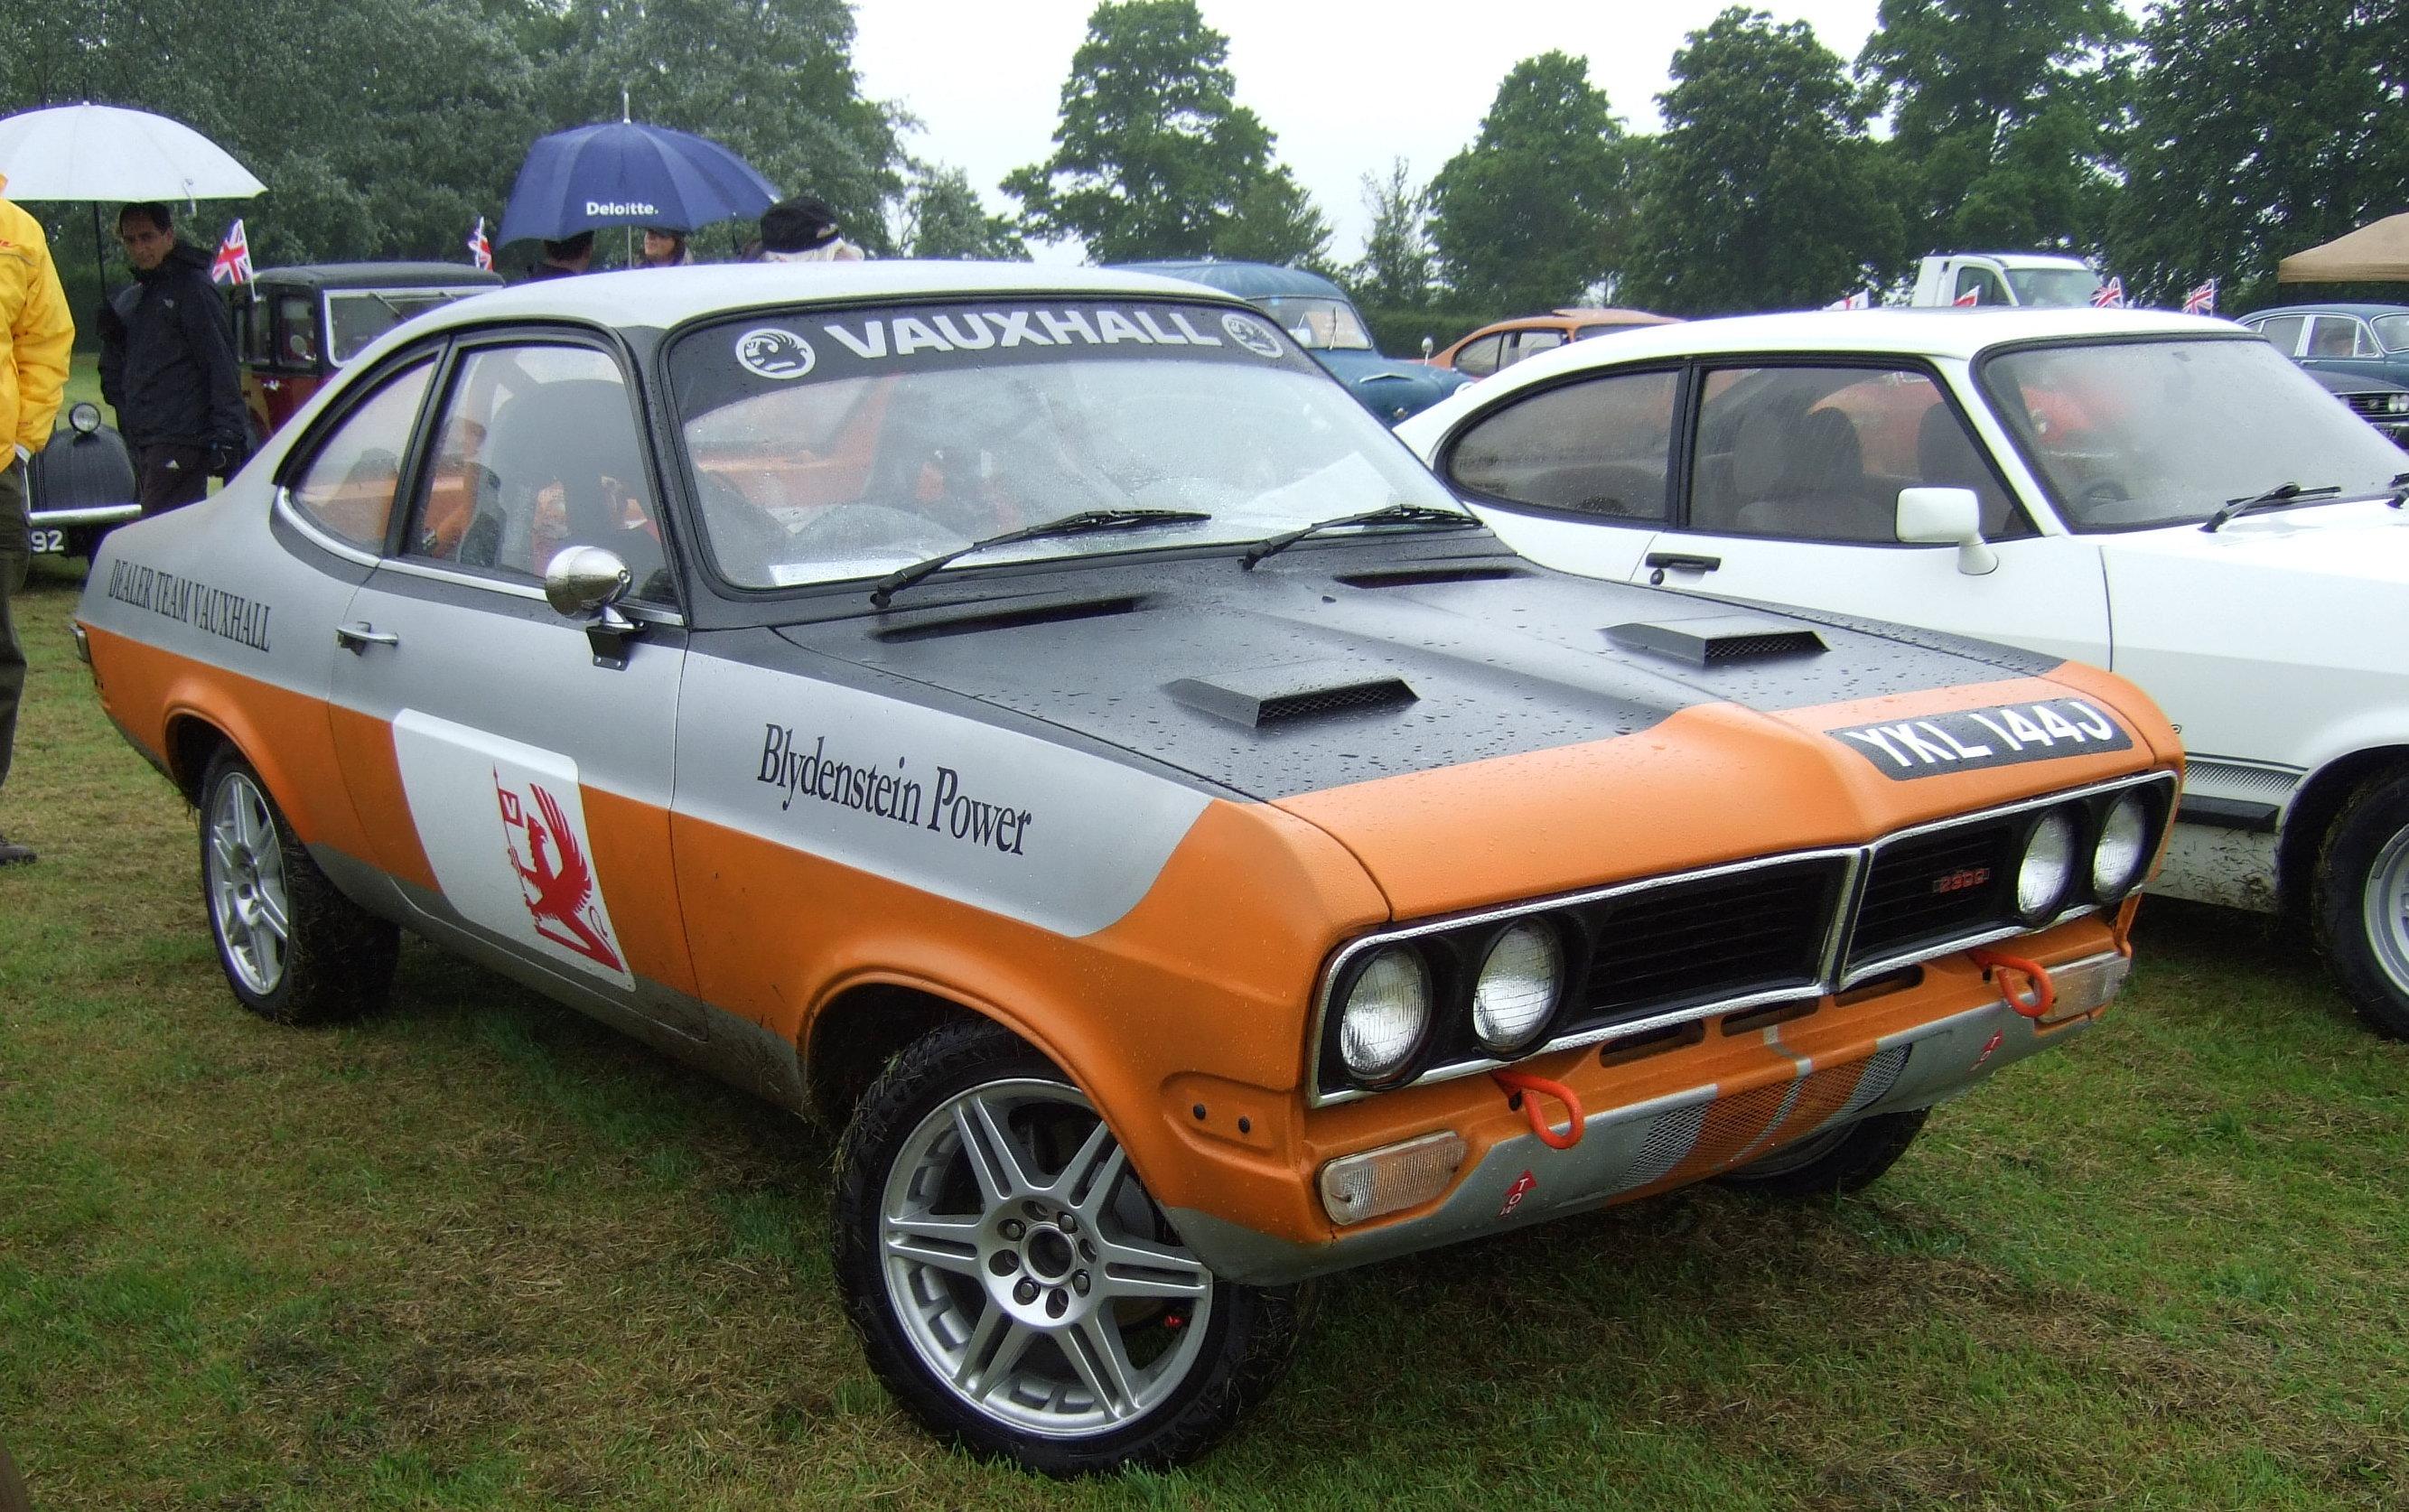 VAUXHALL rally car by Sceptre63 on DeviantArt